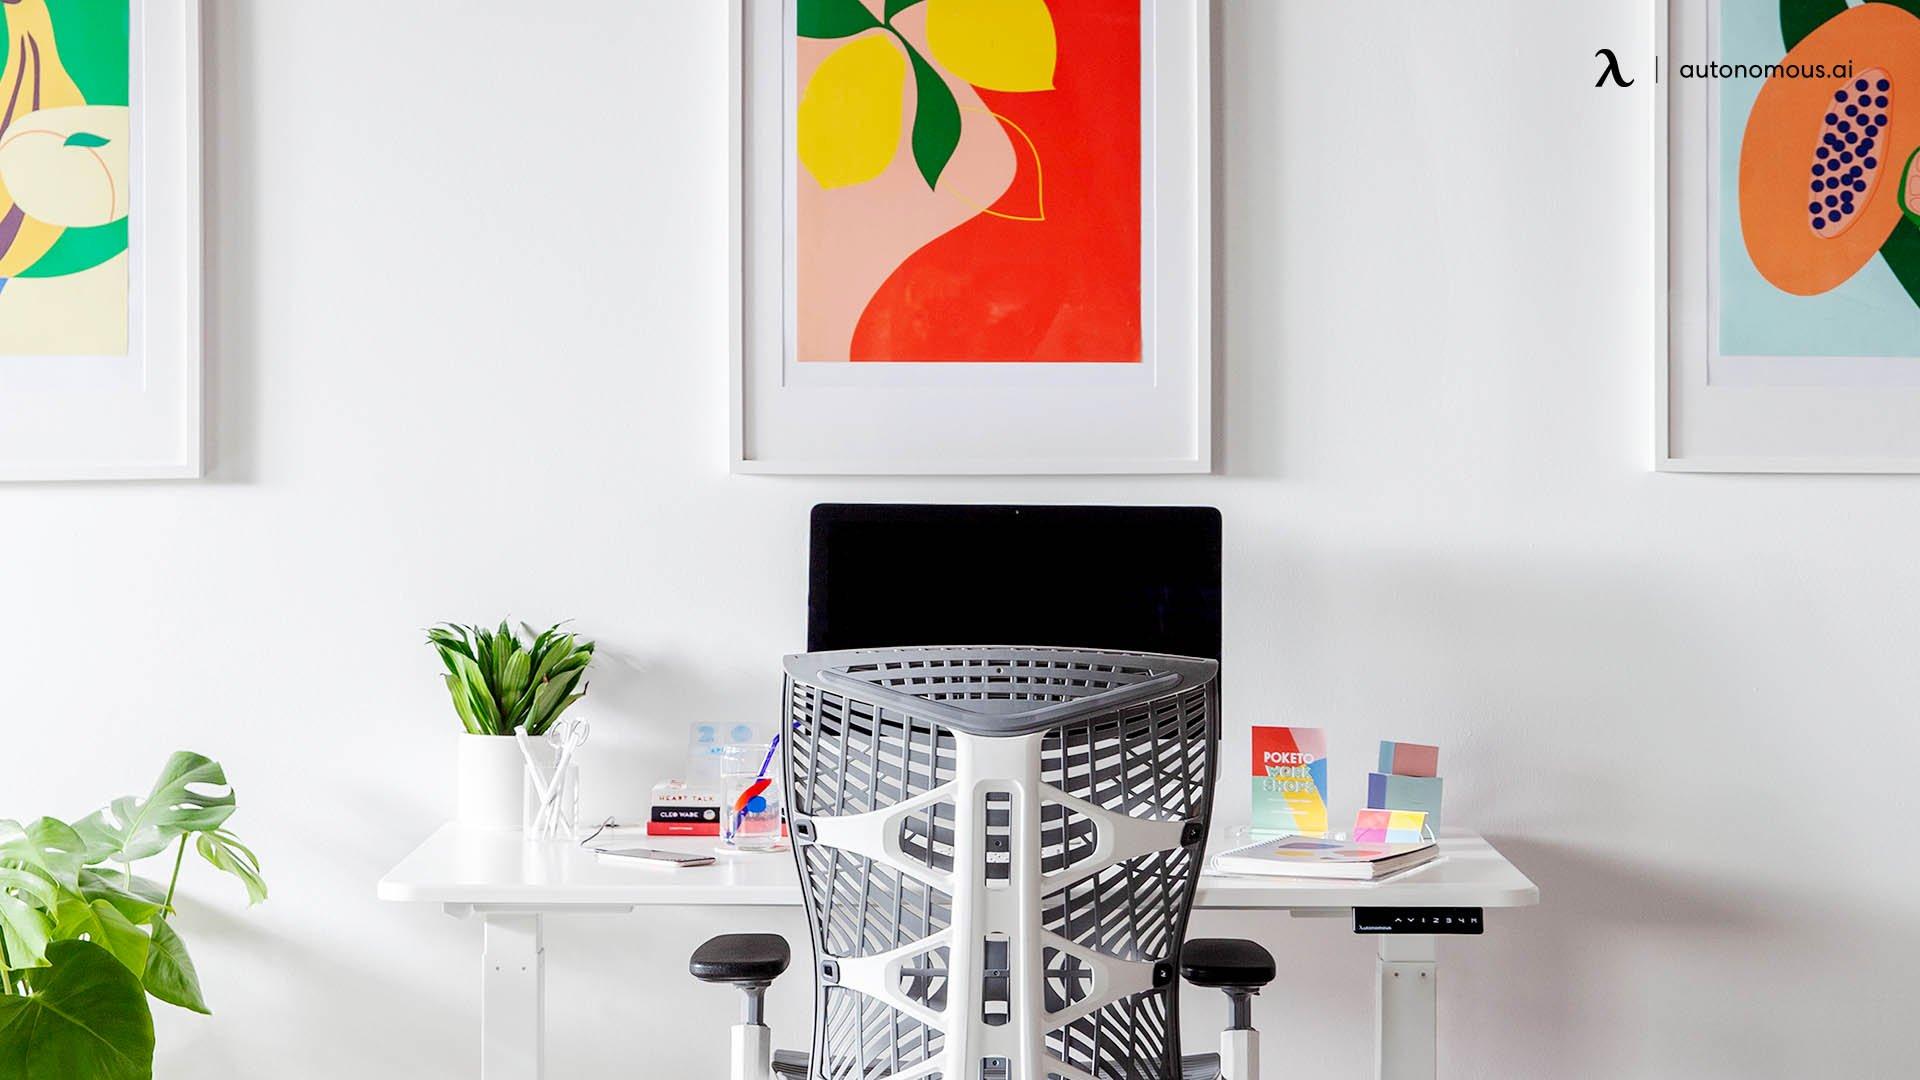 The SmartDesk 2 Home Office